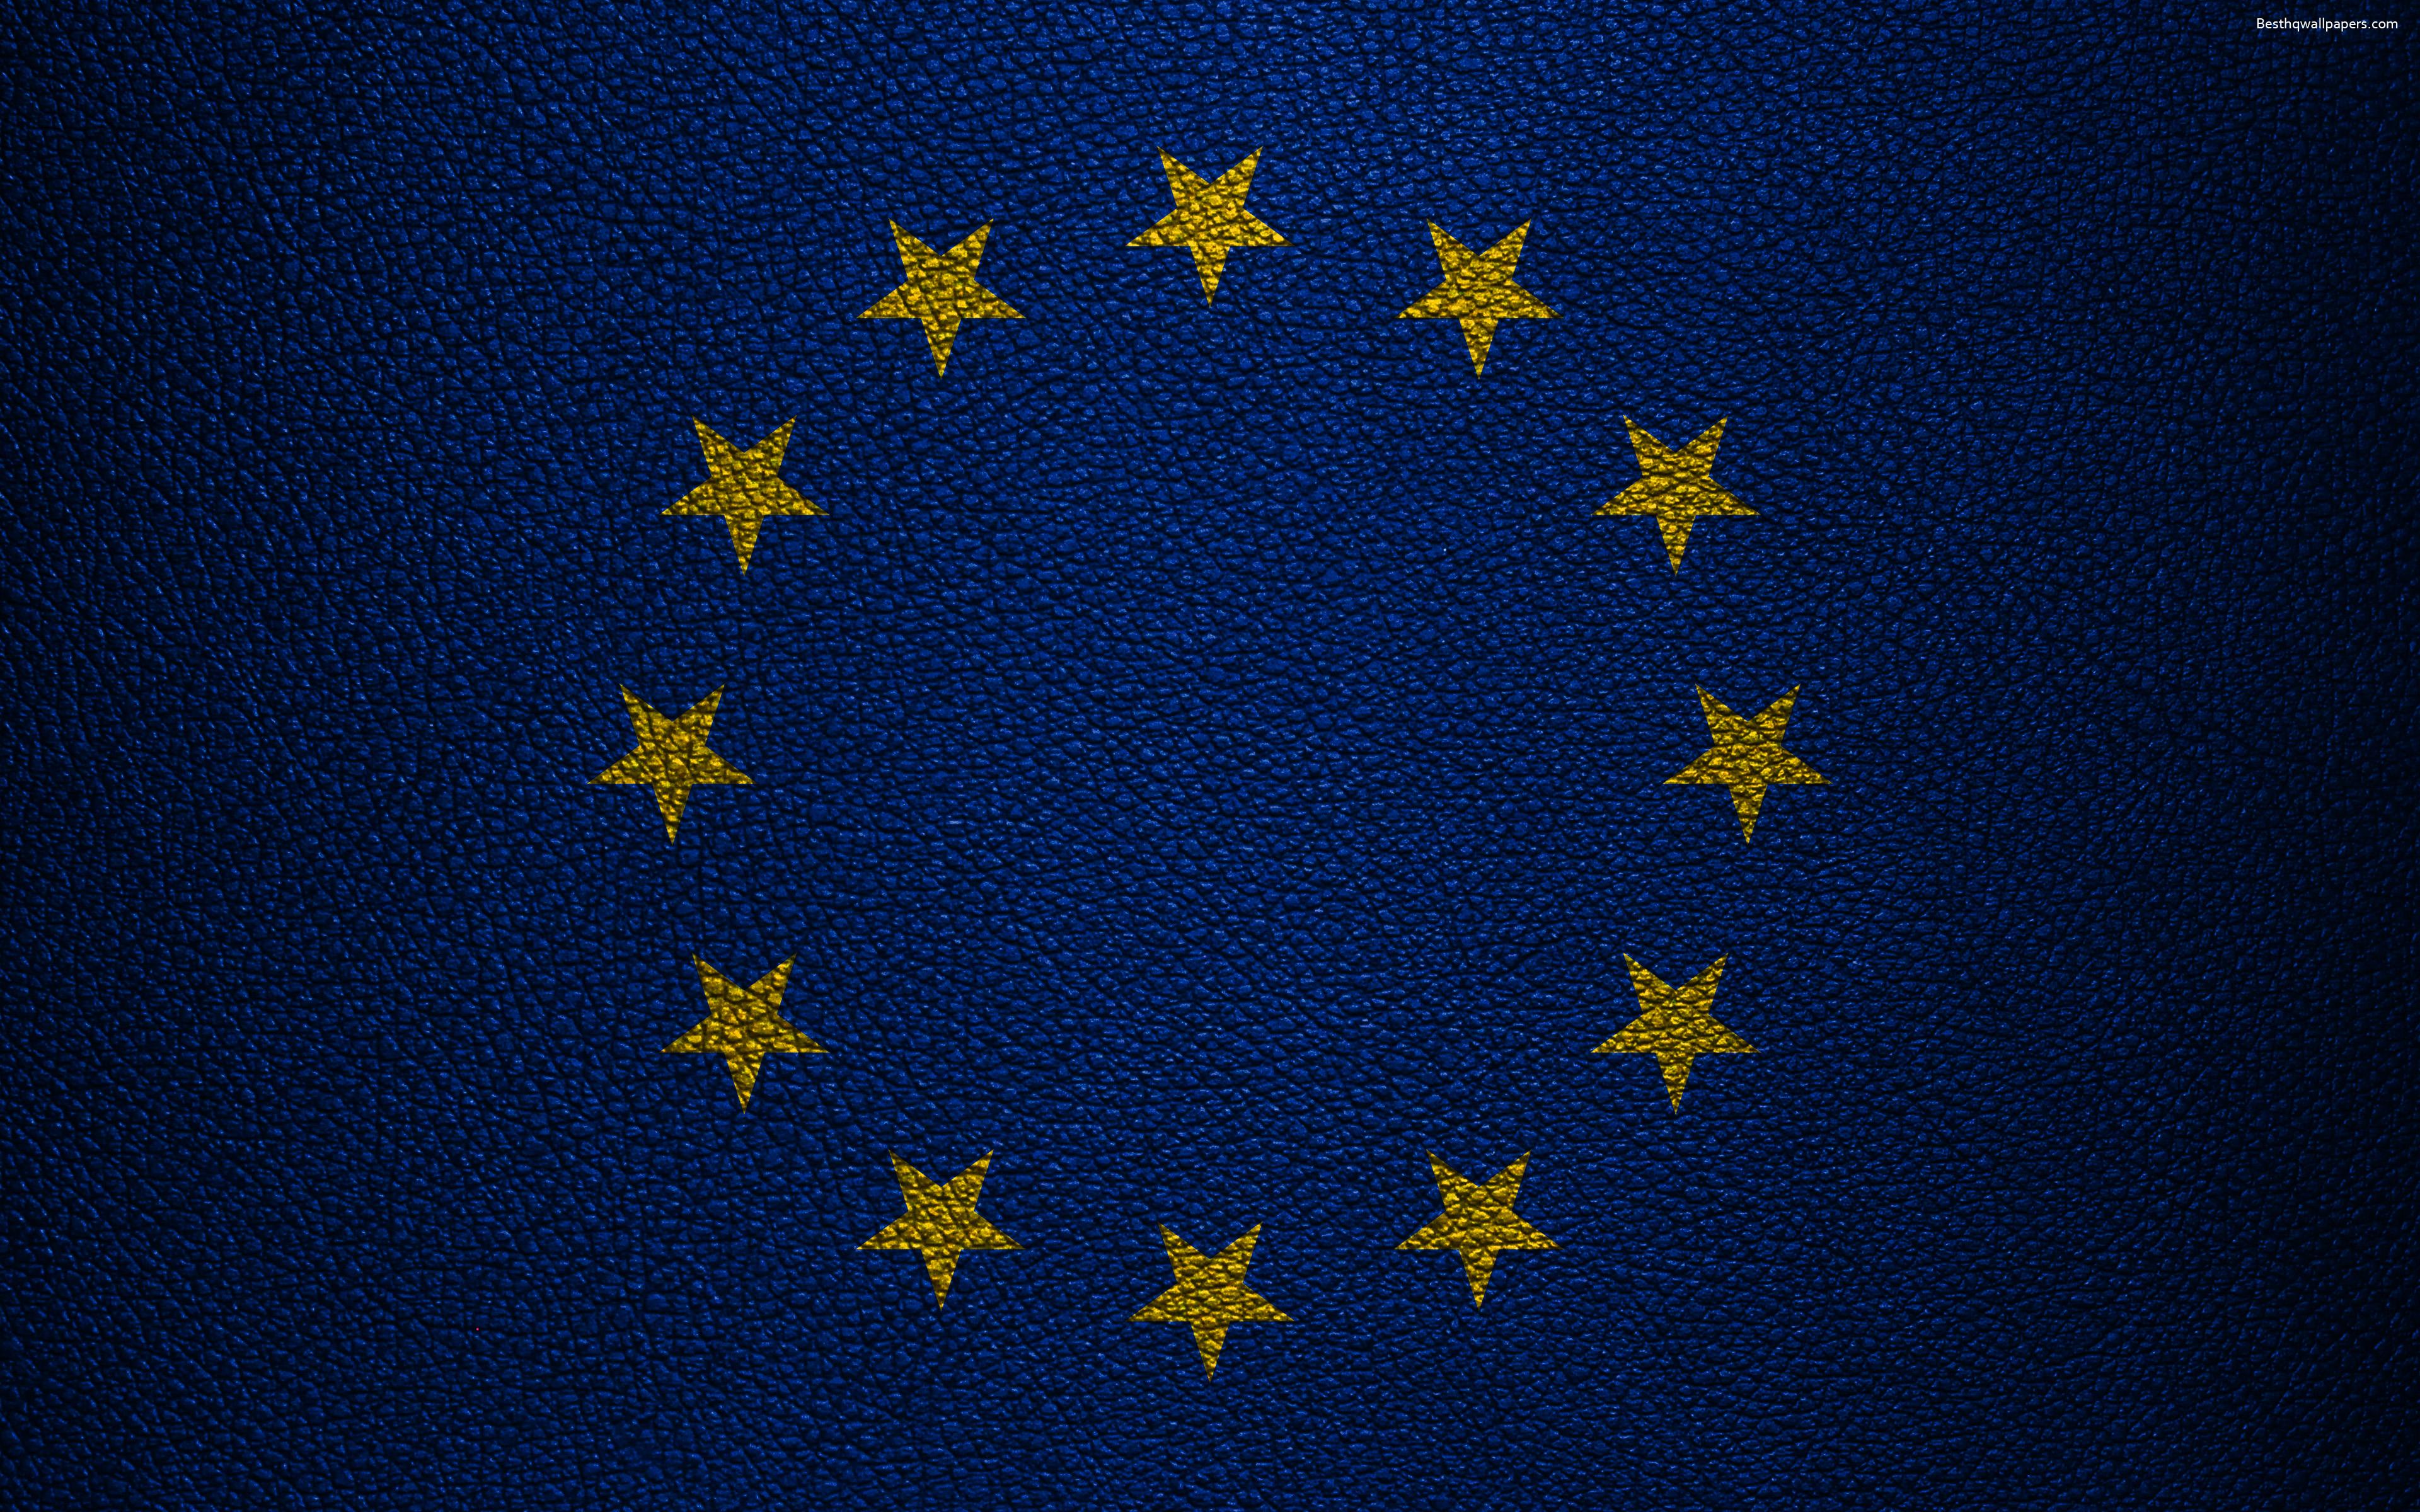 Download wallpapers European Union Flag 4K international 3840x2400